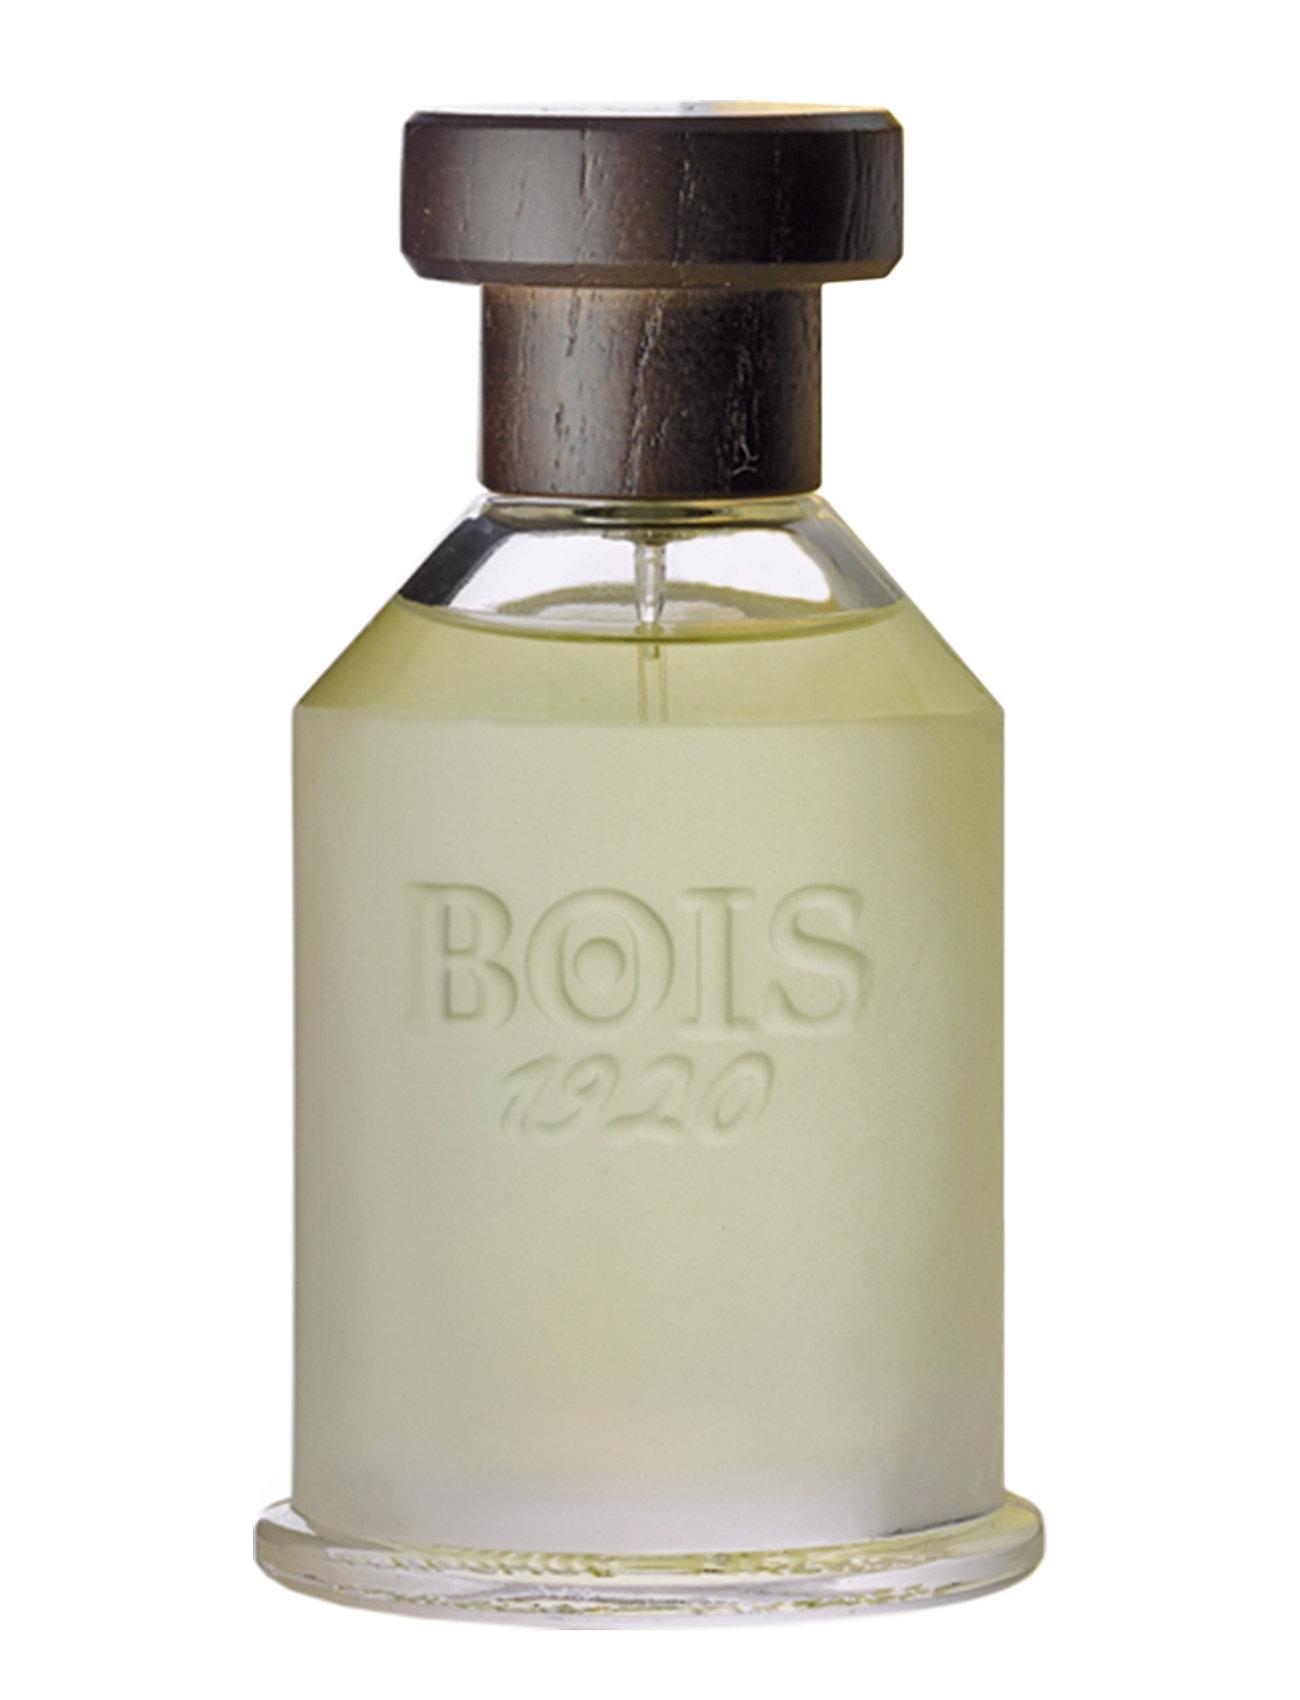 BOIS CLASSIC 1920 - BLACK